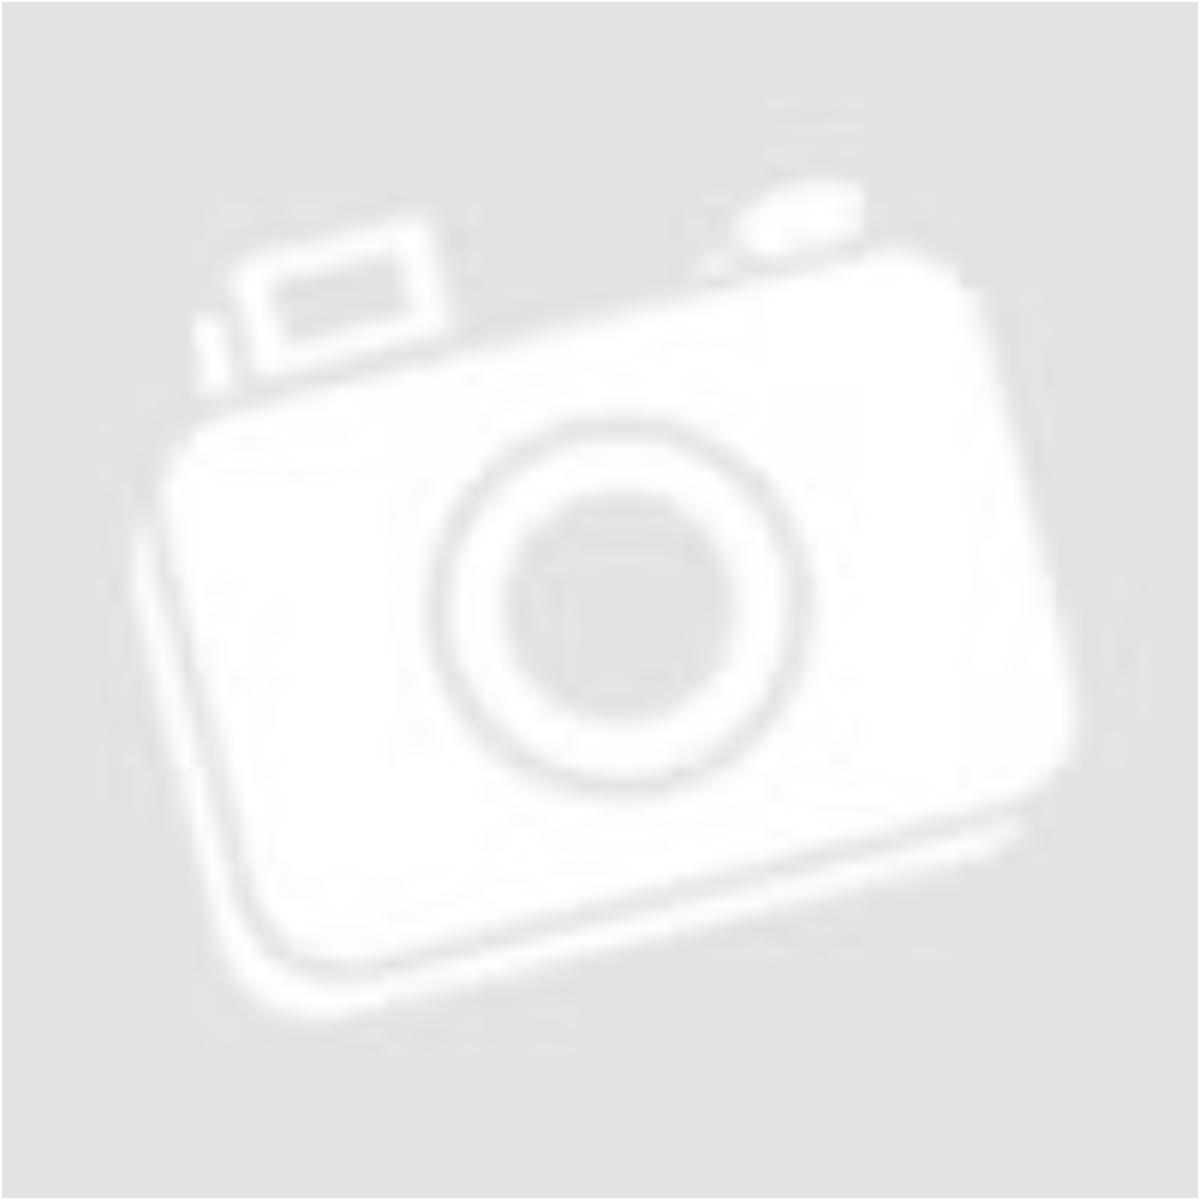 BIANCHI C-SPORT 3 - ALIVIO 2X9SP HYDR. DISC kerékpár